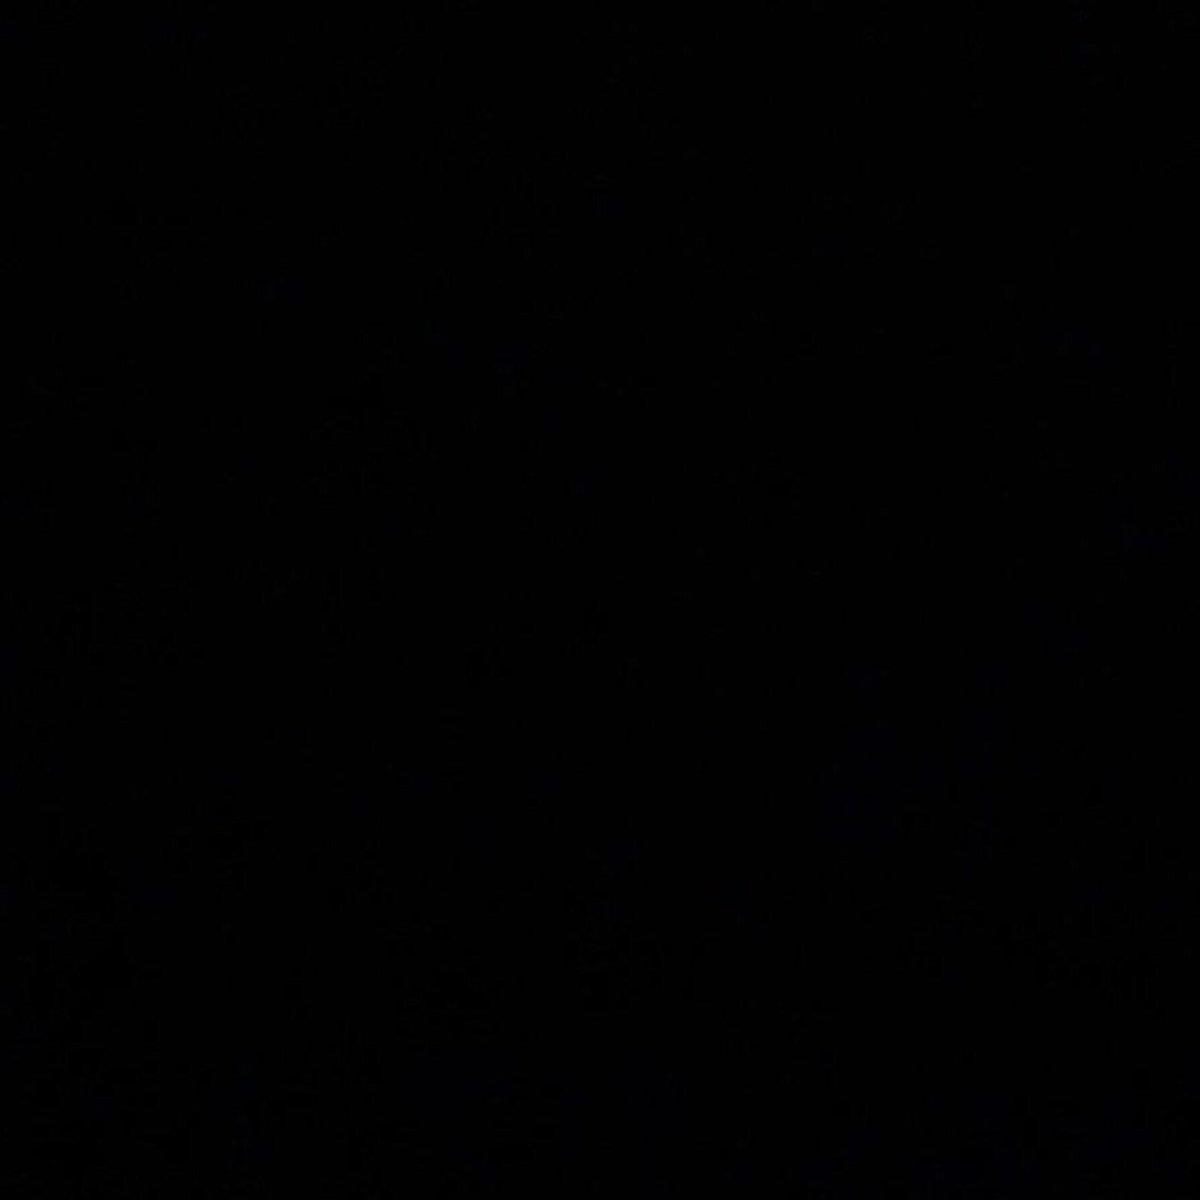 #BlackOutTuesday #BlackLivesMatter https://t.co/8BtVKxmHkI